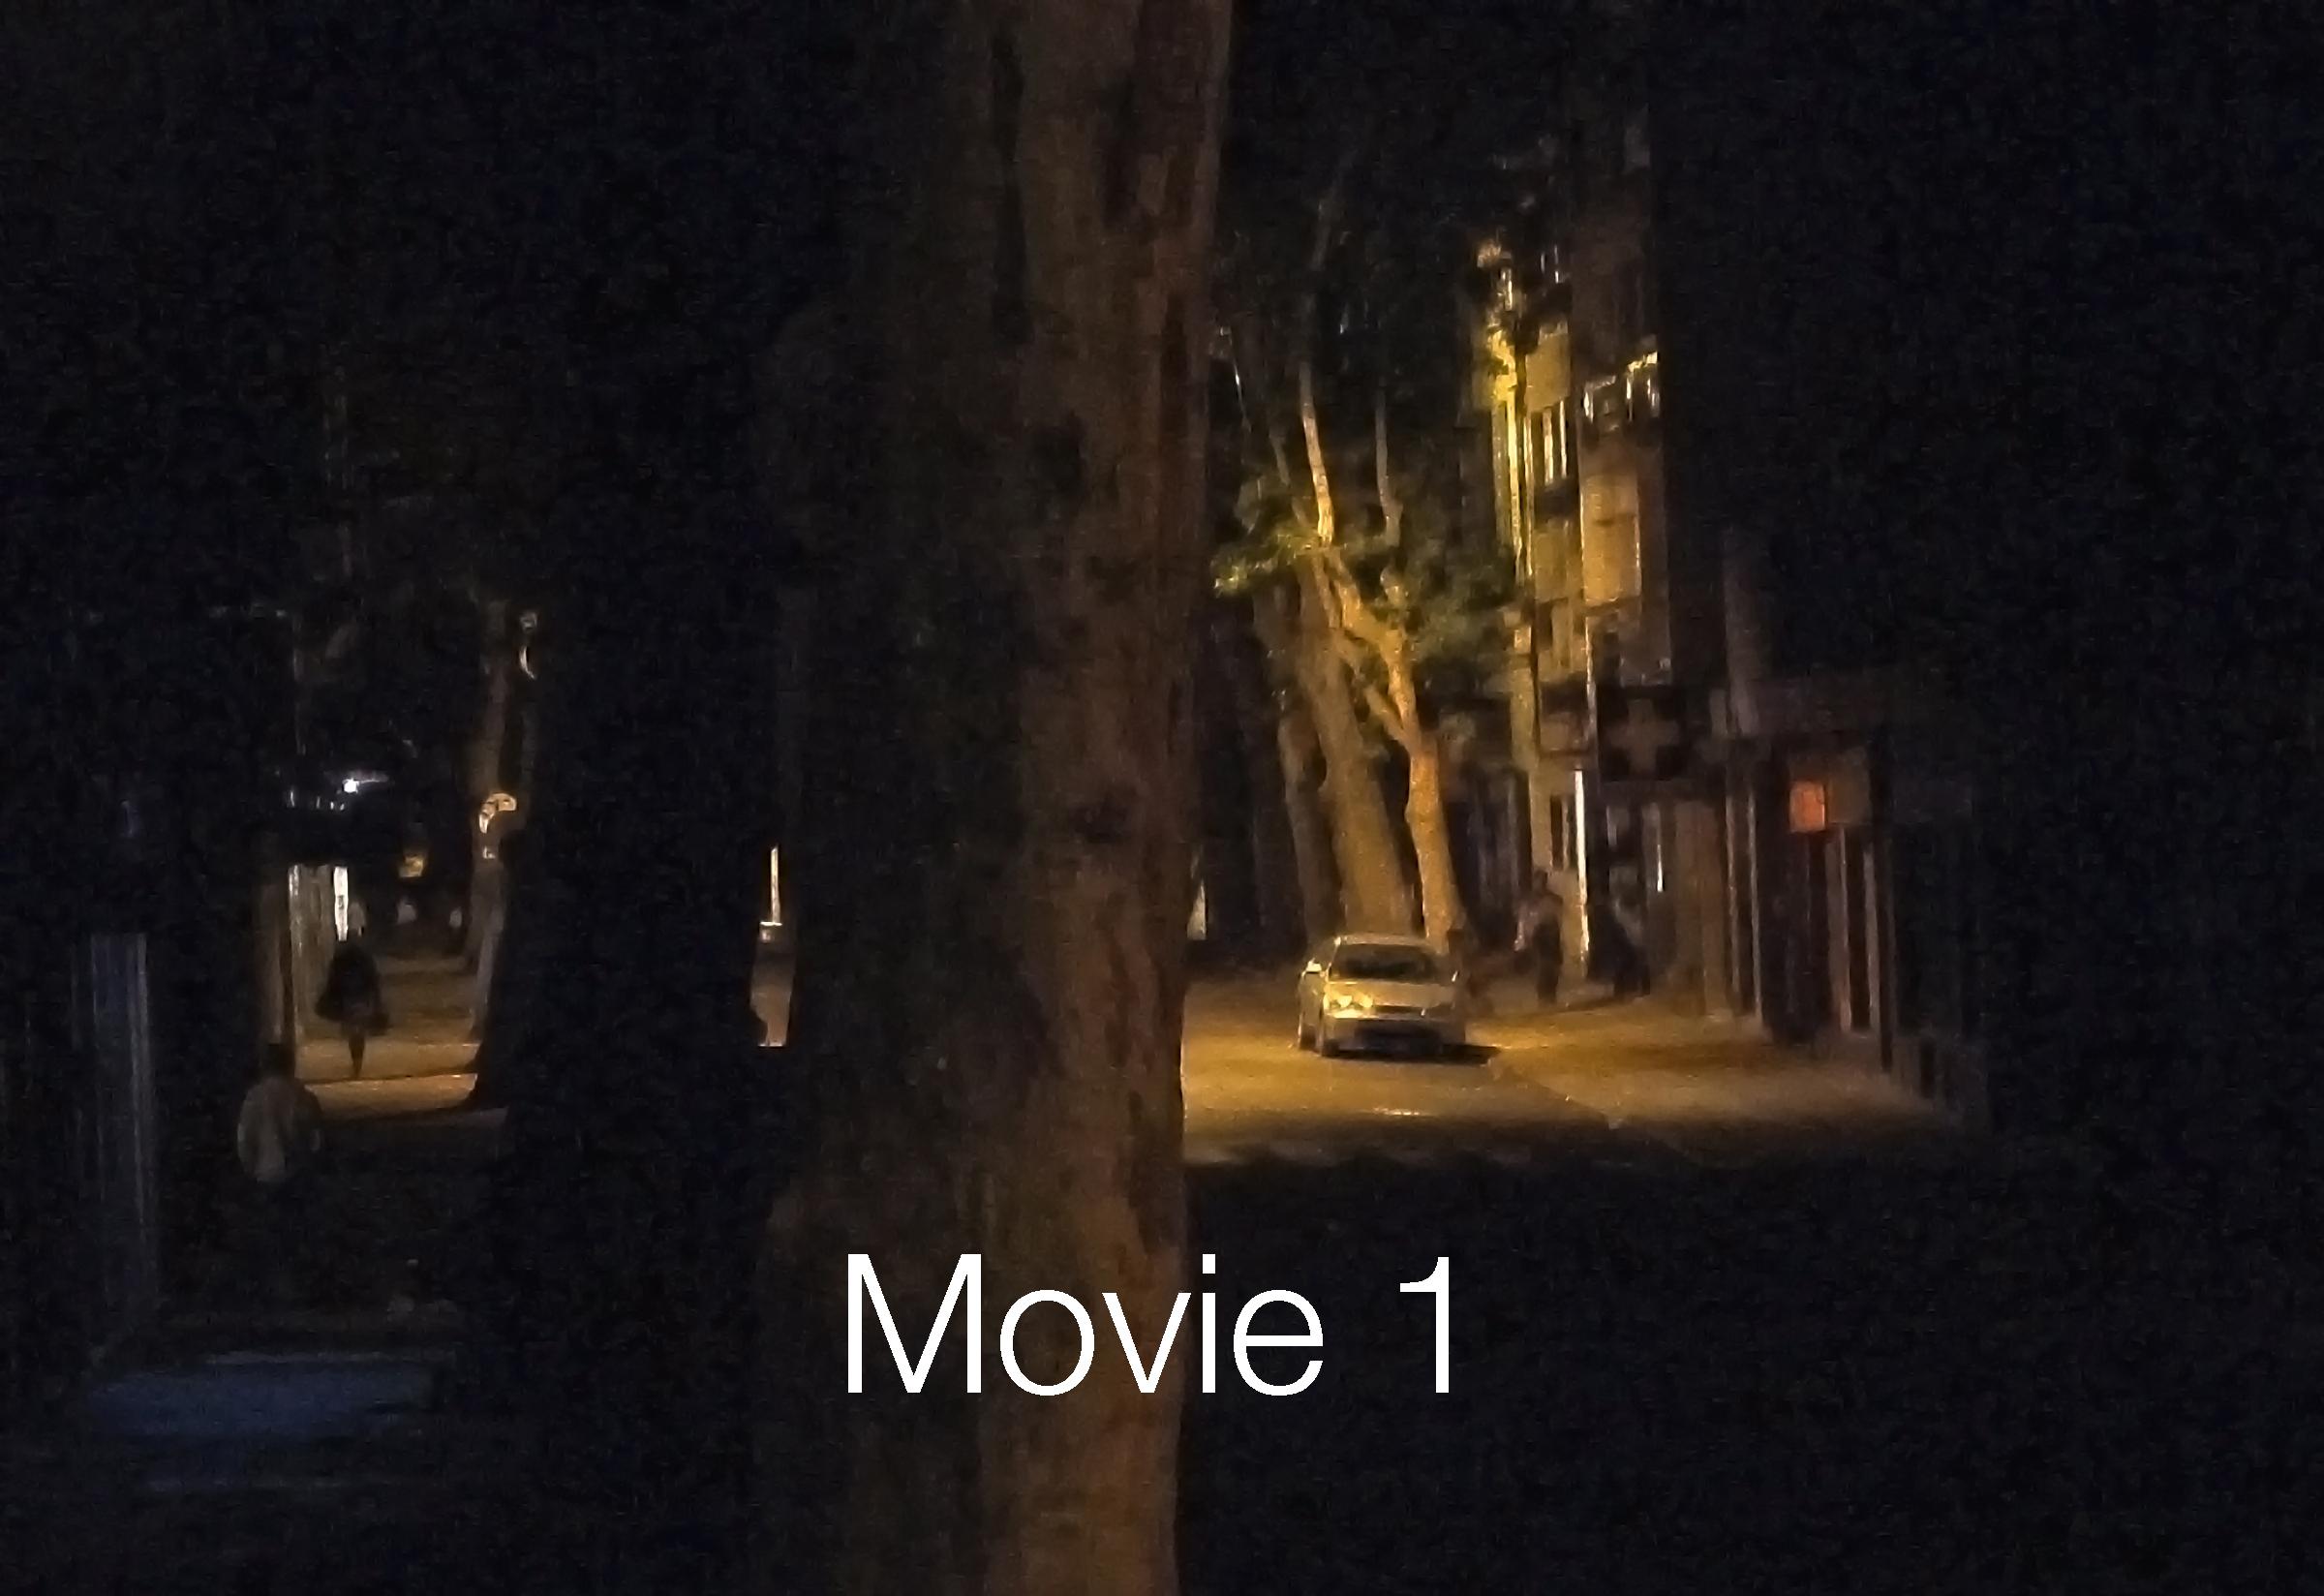 00 Movie 1 Title page 3.jpg